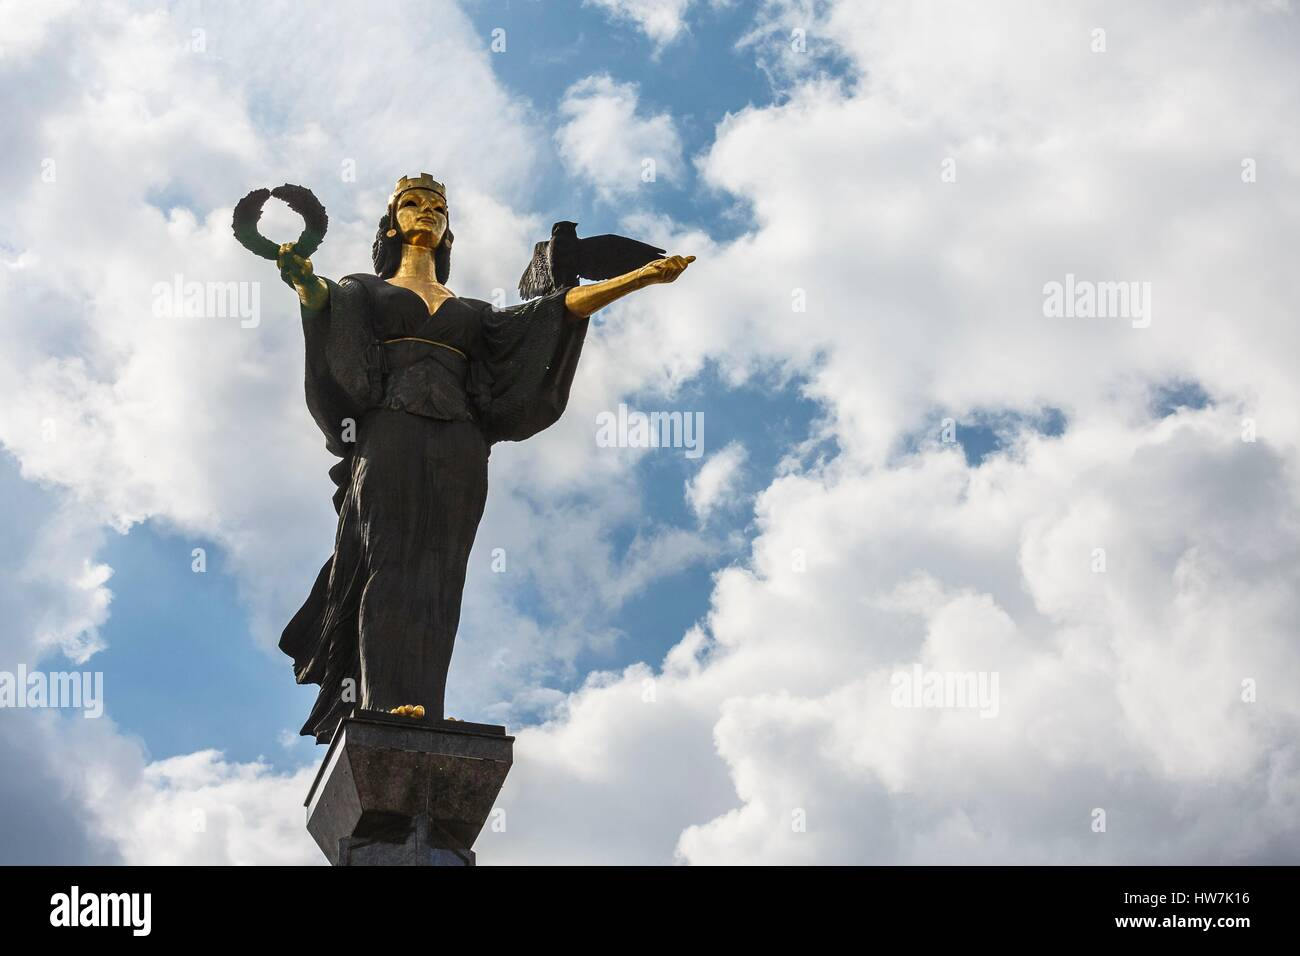 Bulgaria, Sofia, Saint Sophia column - Stock Image